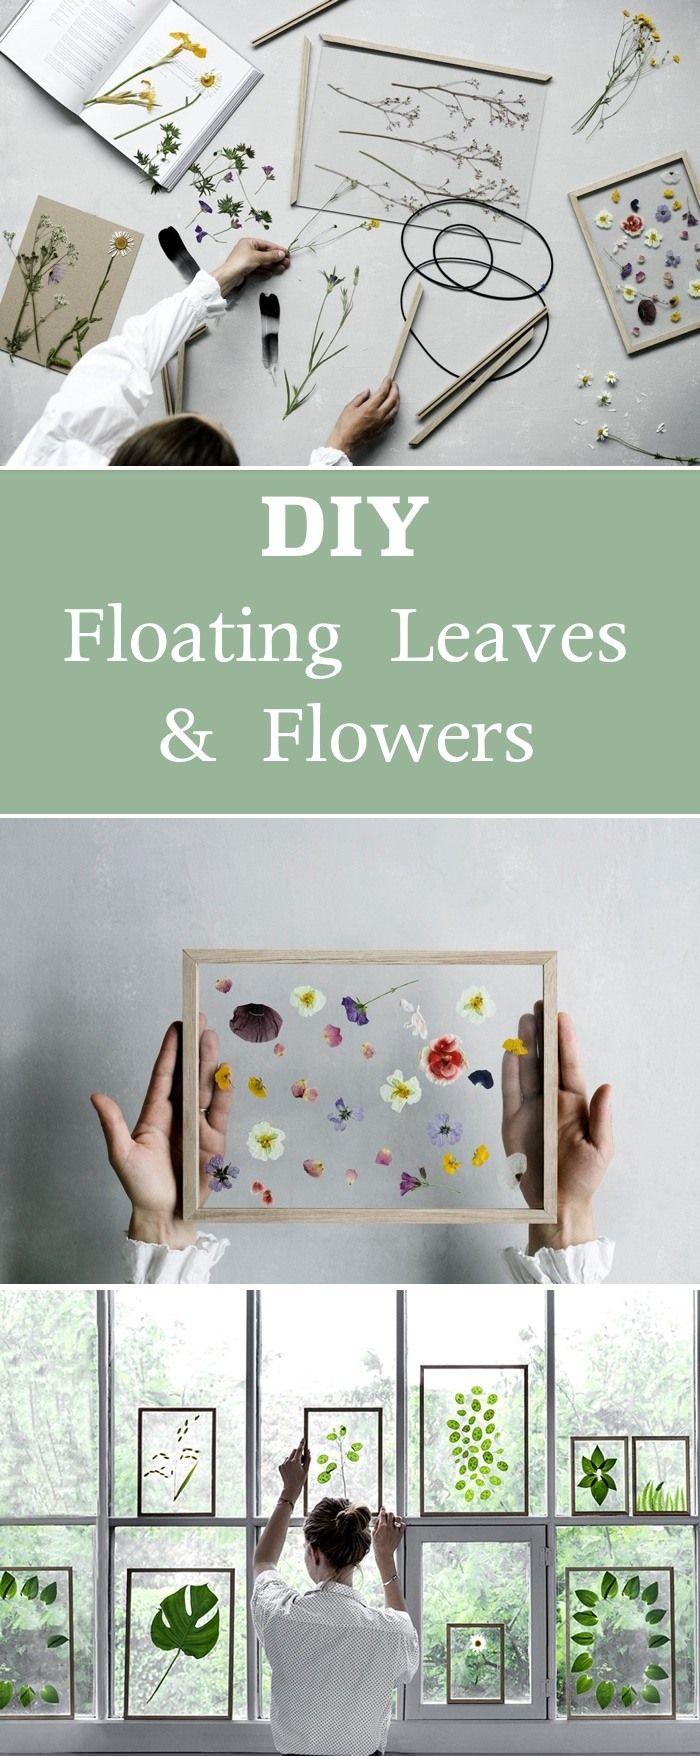 17 Easy Diy Home Decor Craft Projects Homelovr Crafts Decor Crafts Room Diy